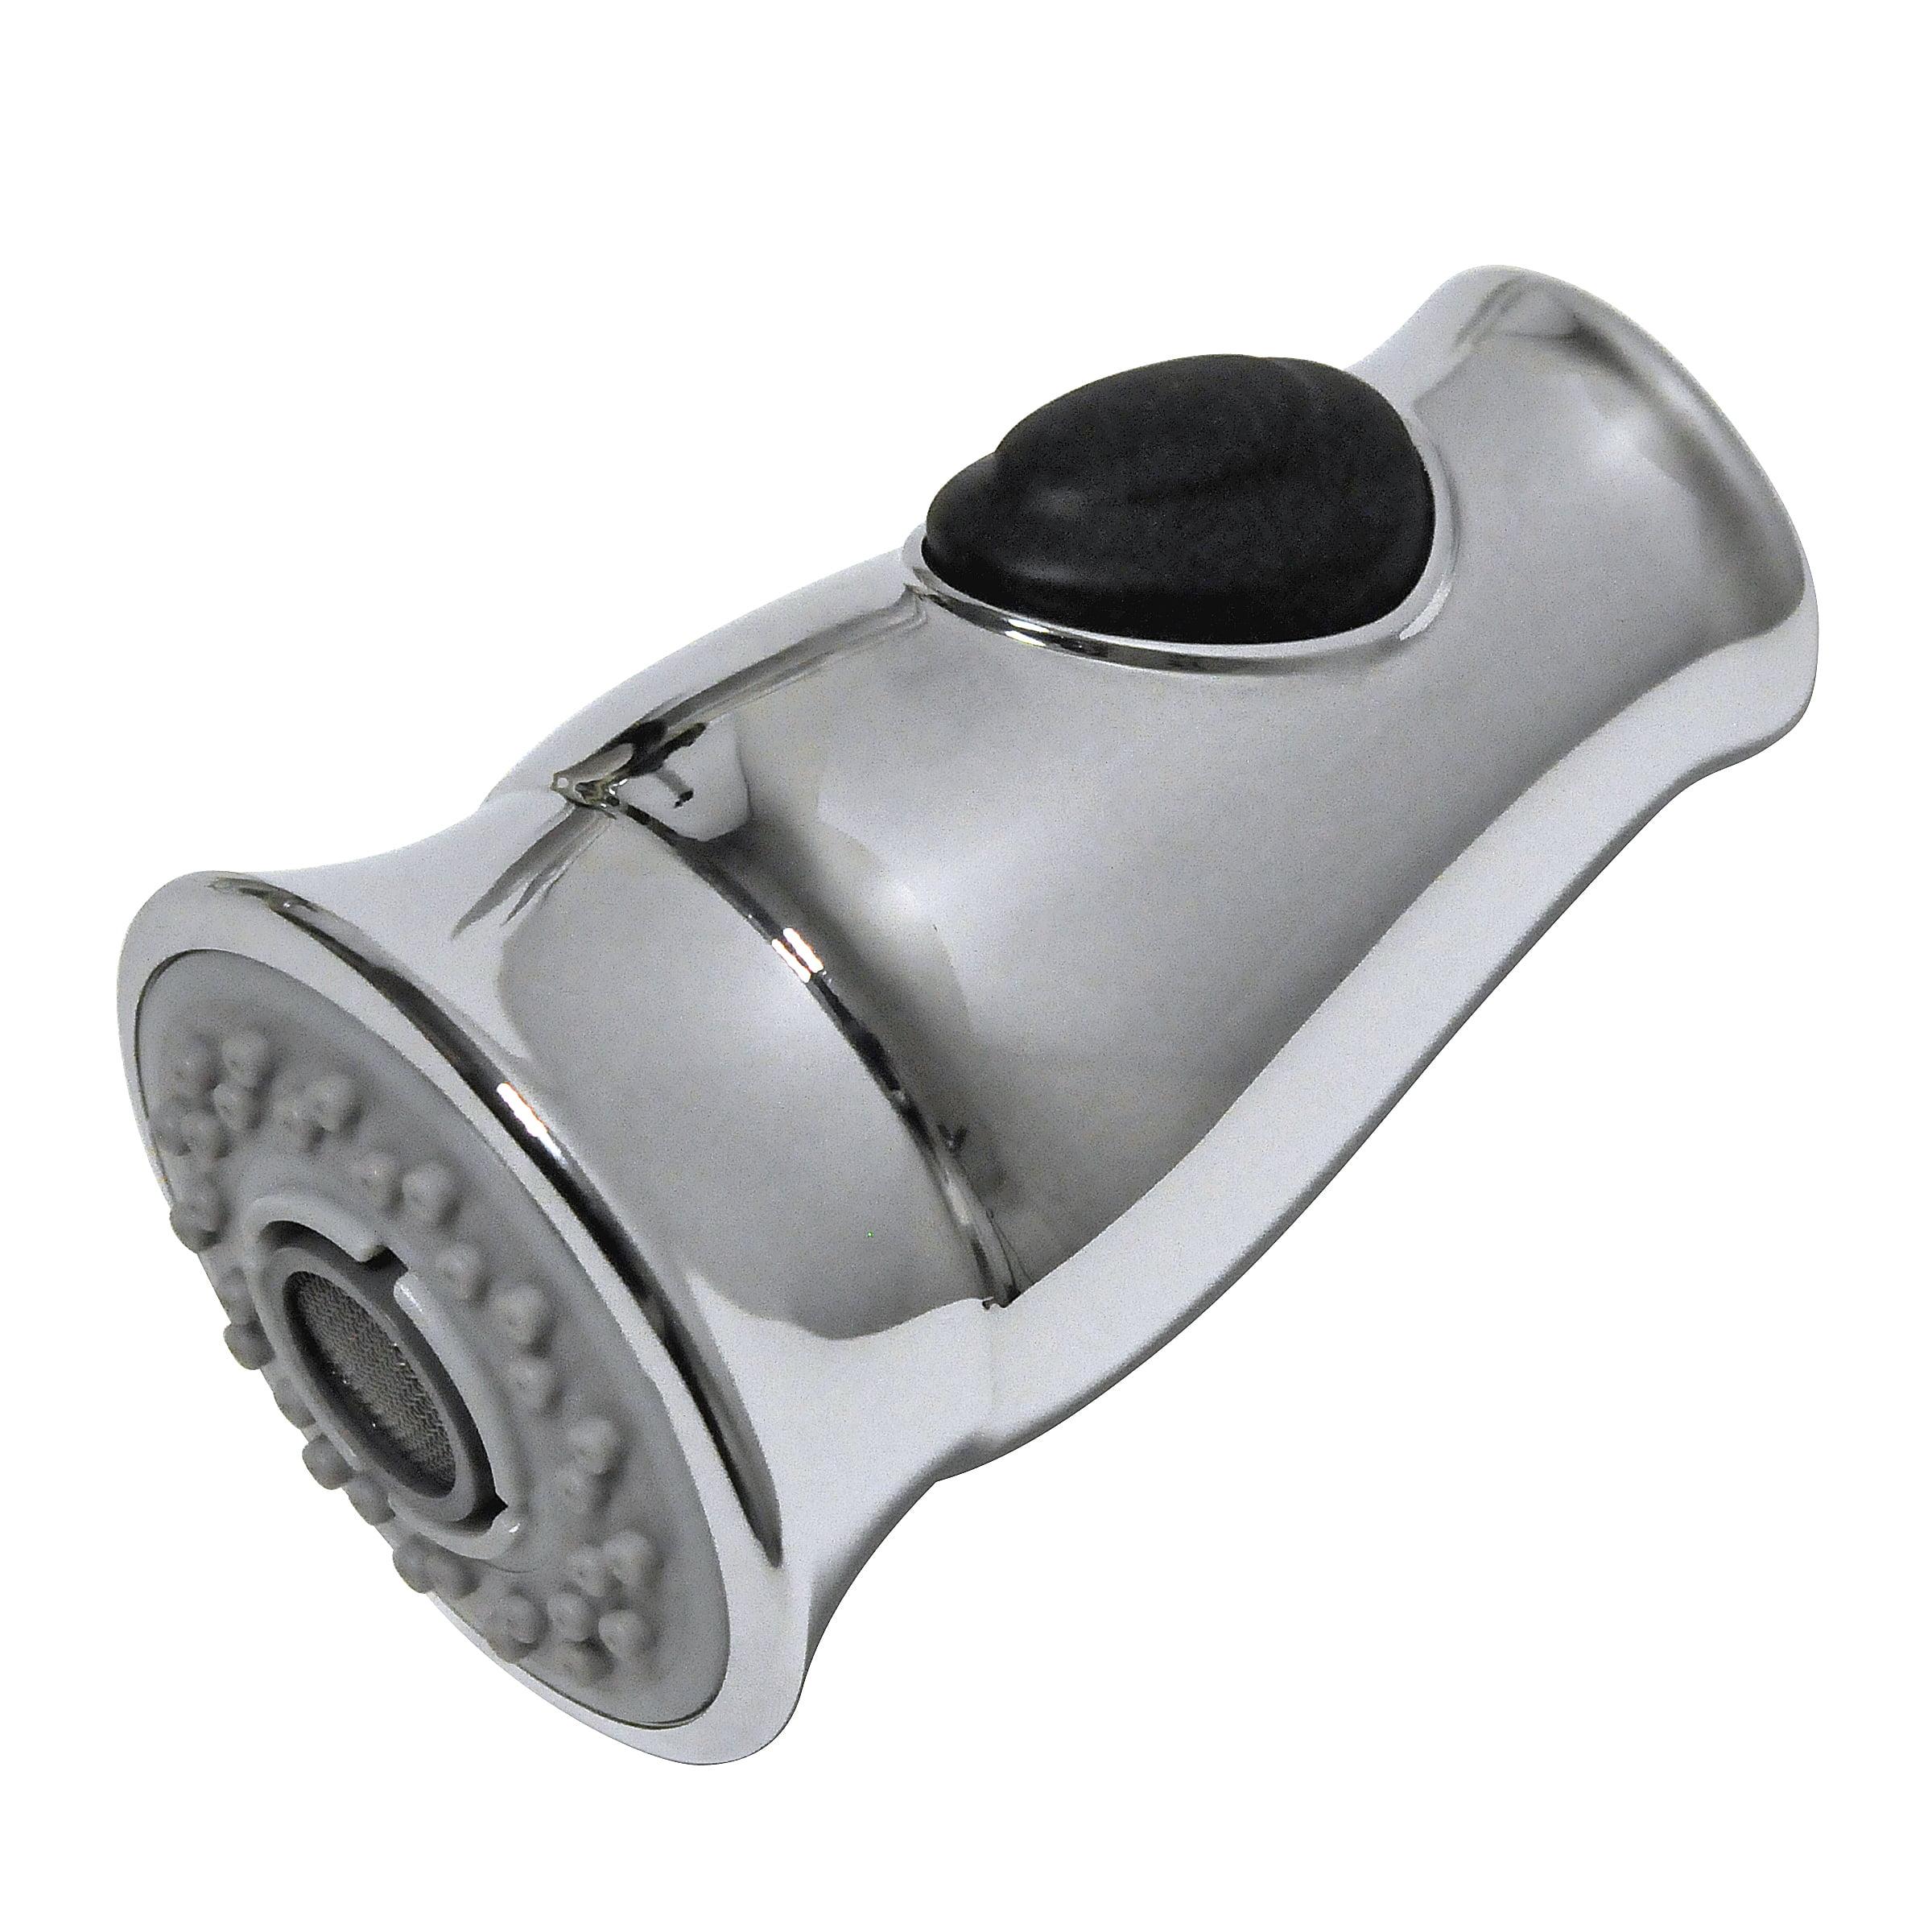 Danco Traditional Smart Spray Kitchen Sink Faucet Pull Down Faucet Spray Head Chrome 1 Pack 10723 Walmart Com Walmart Com